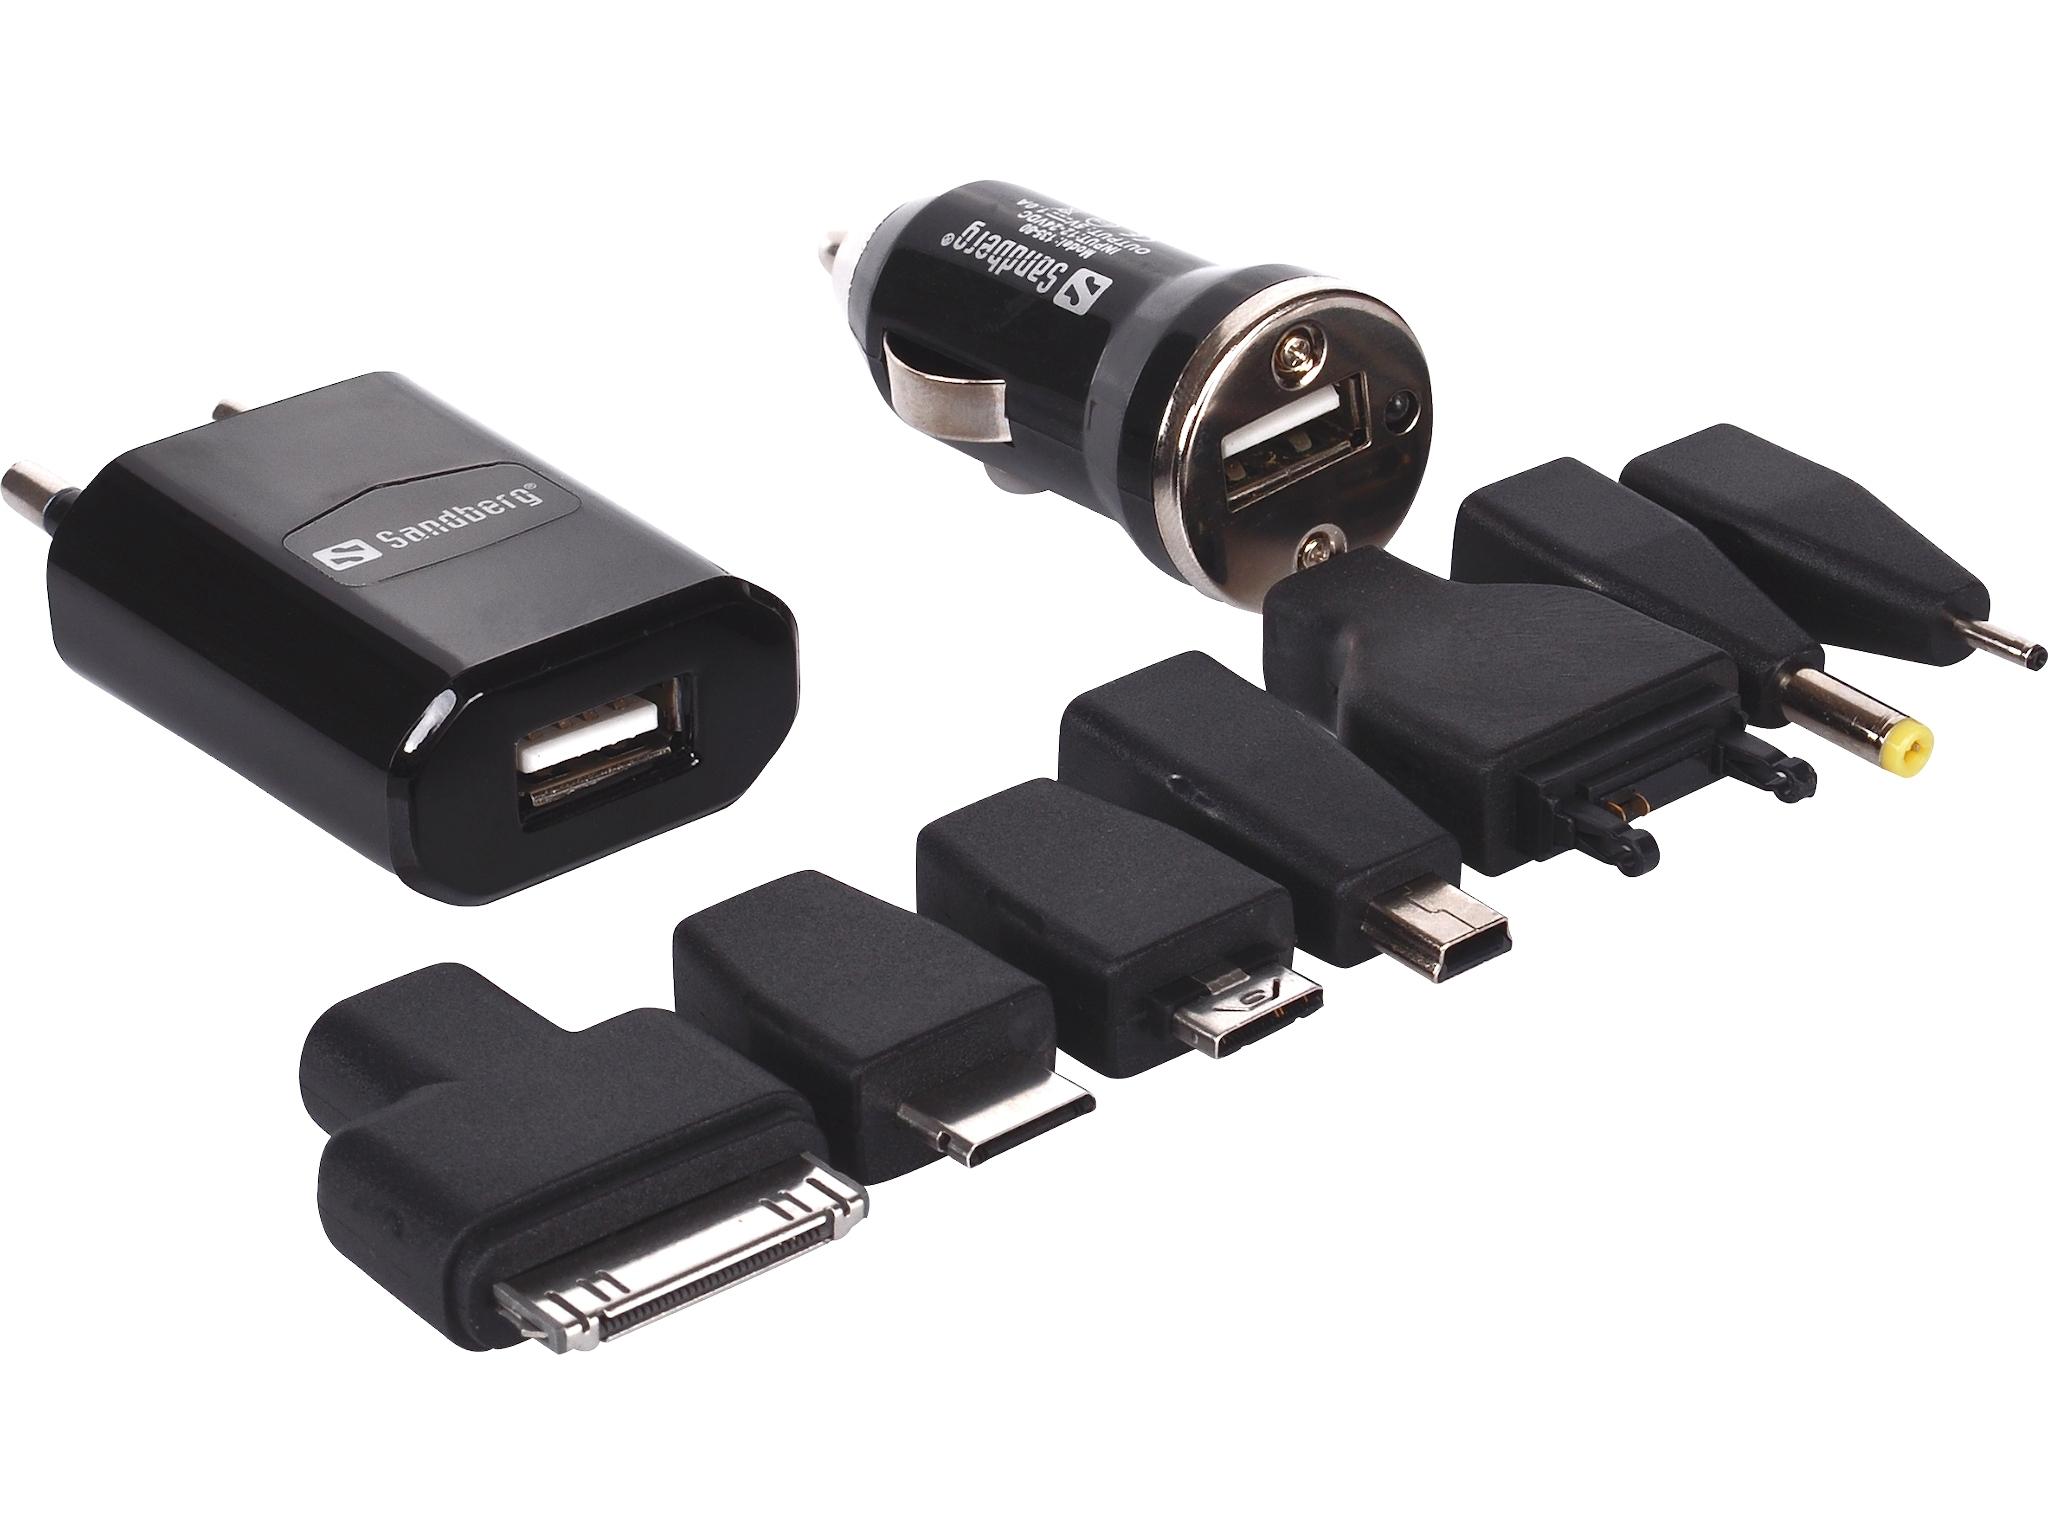 SANDBERG Mobile Phone Multi Charger 230V 12V 24V und USB iPhone iPod Sony Ericsson LG Samsung Nokia Micro USB Mini USB